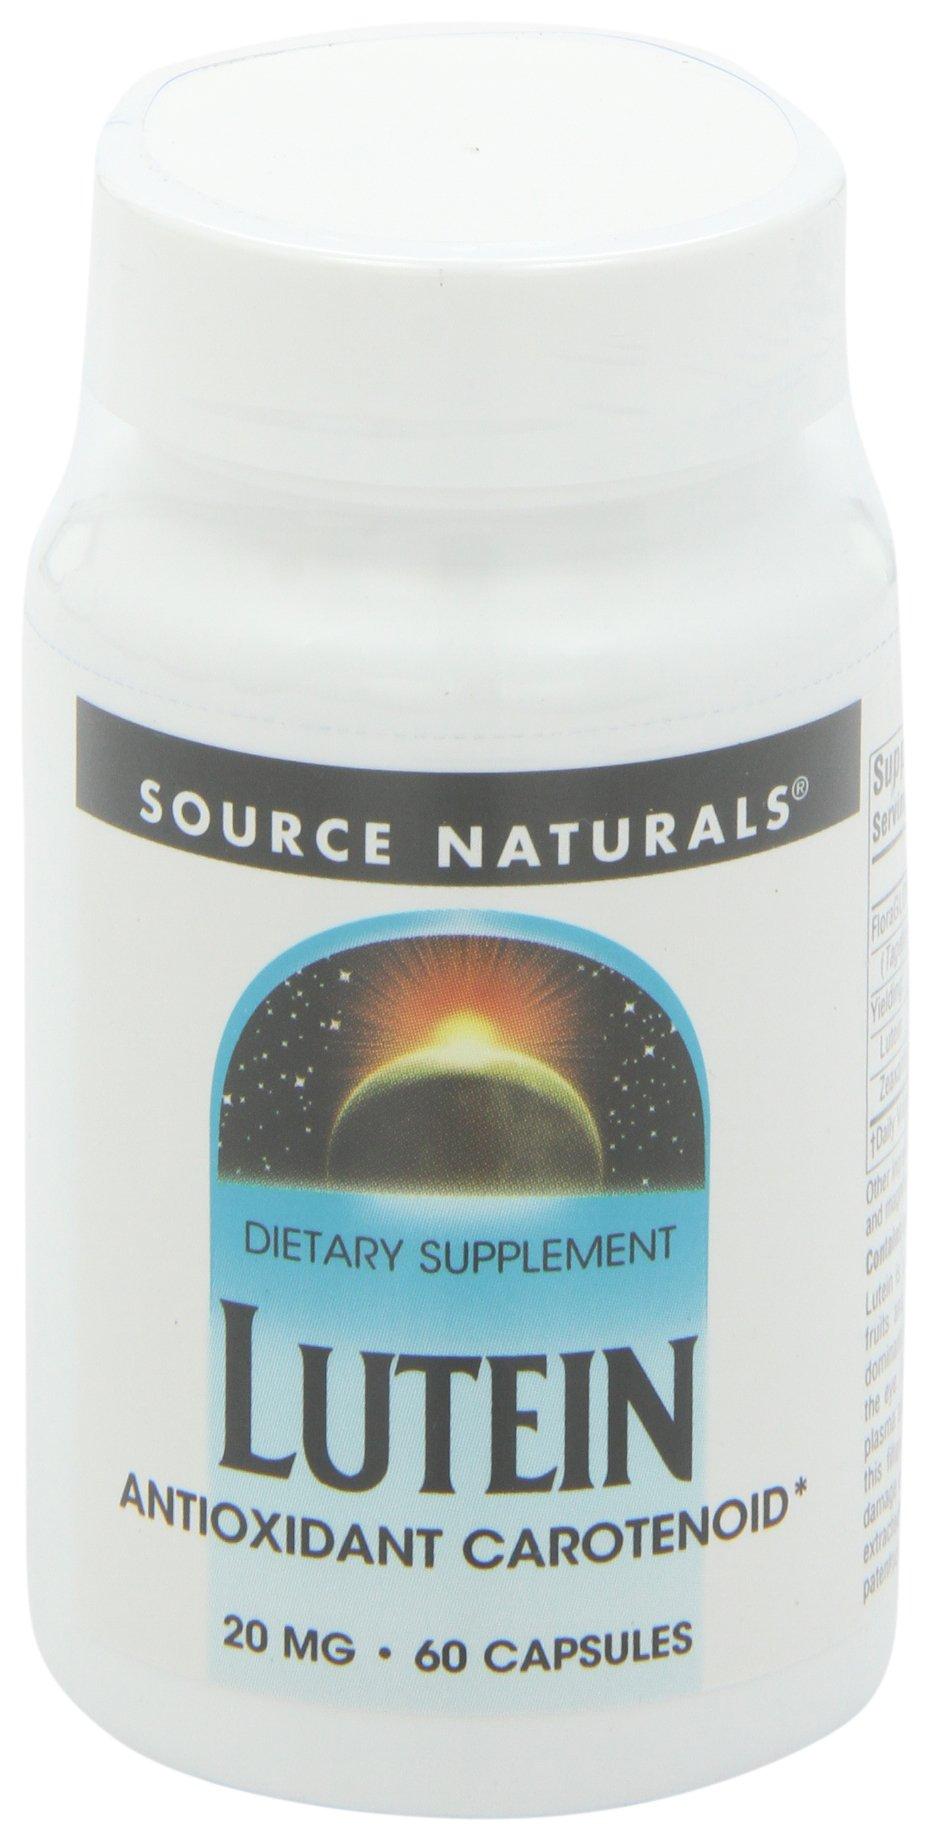 Source Naturals Lutein 20mg, Potent Antioxidant Carotenoid, 60 Capsules